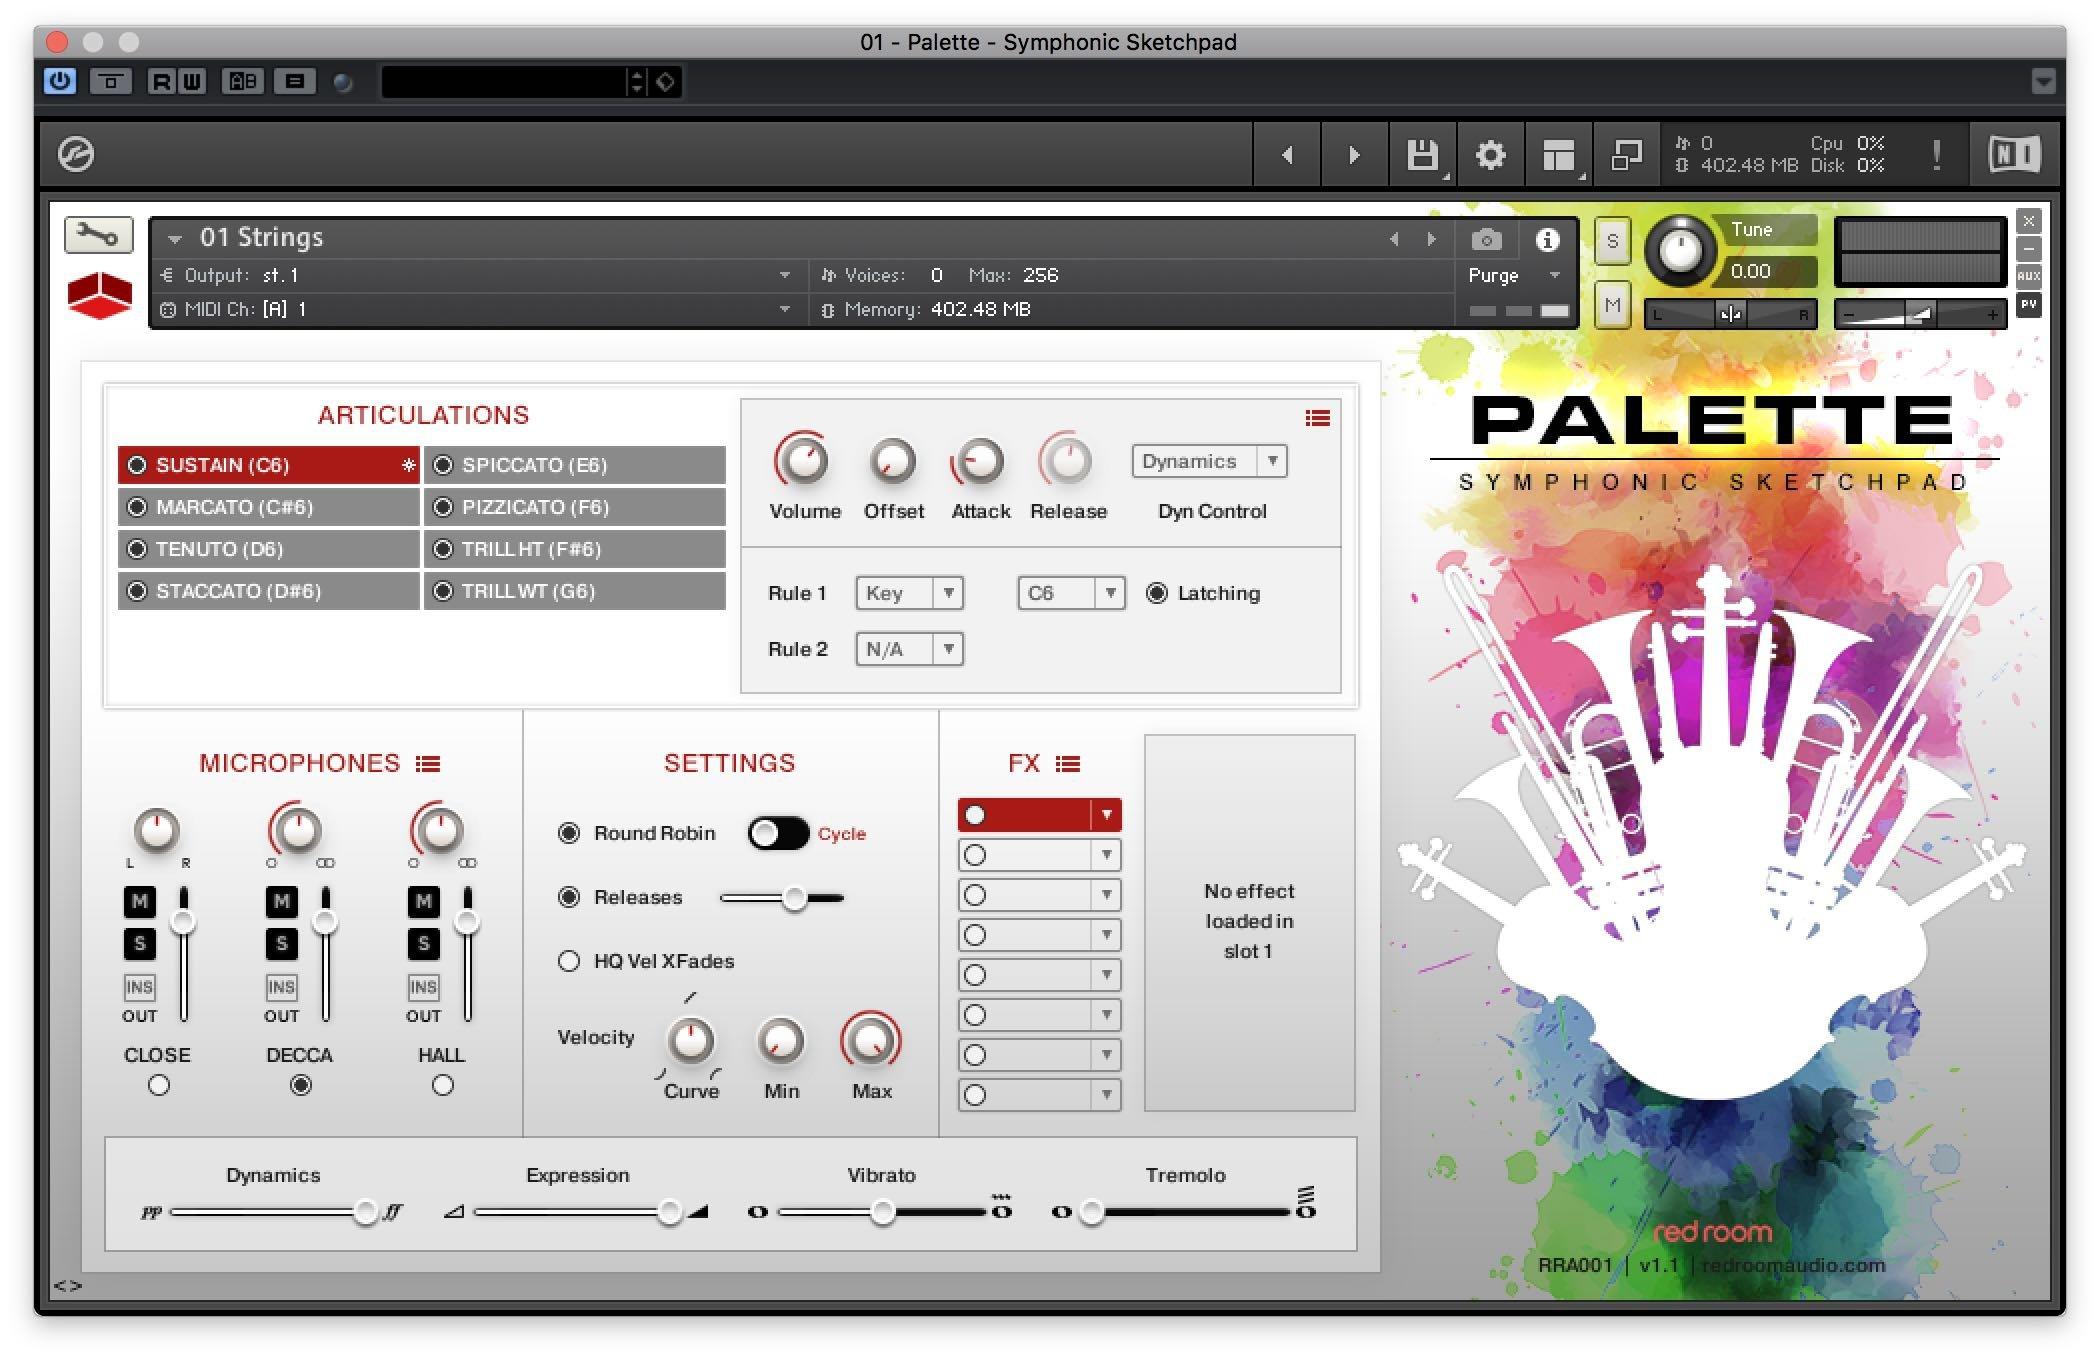 Palette Symphonic Sketchpad - interfaccia